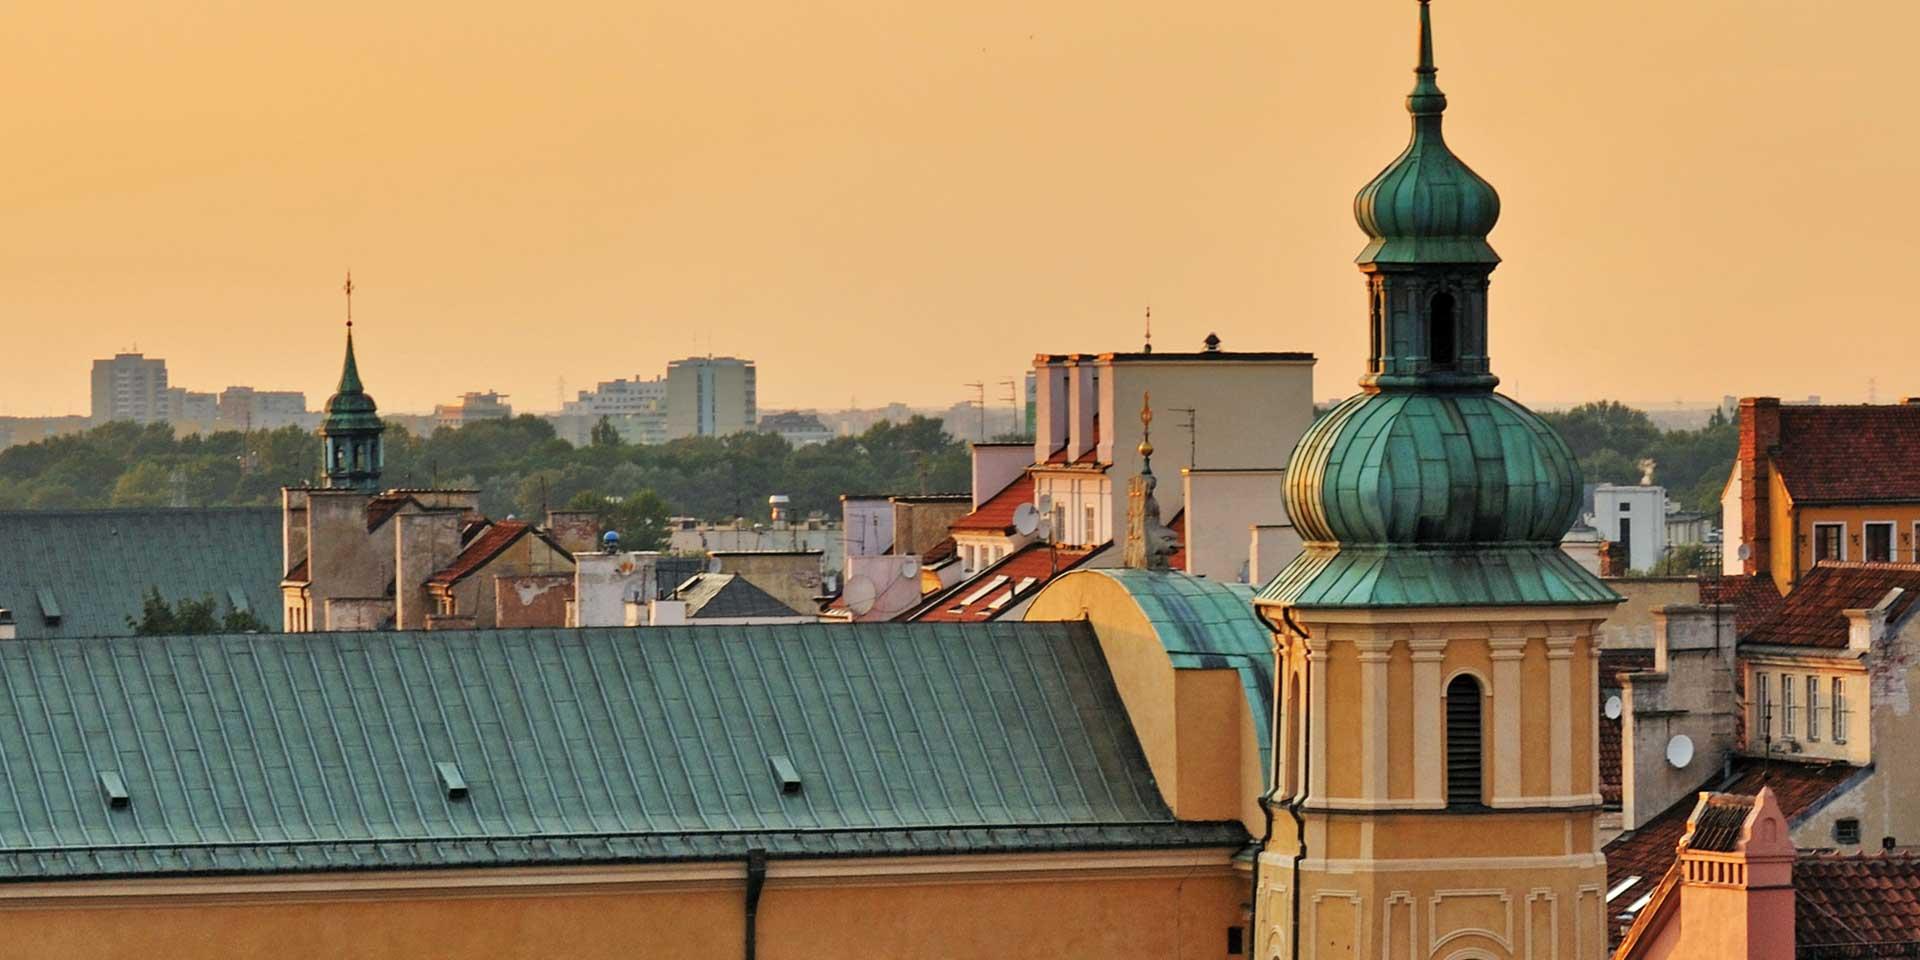 Warsaw White & Case